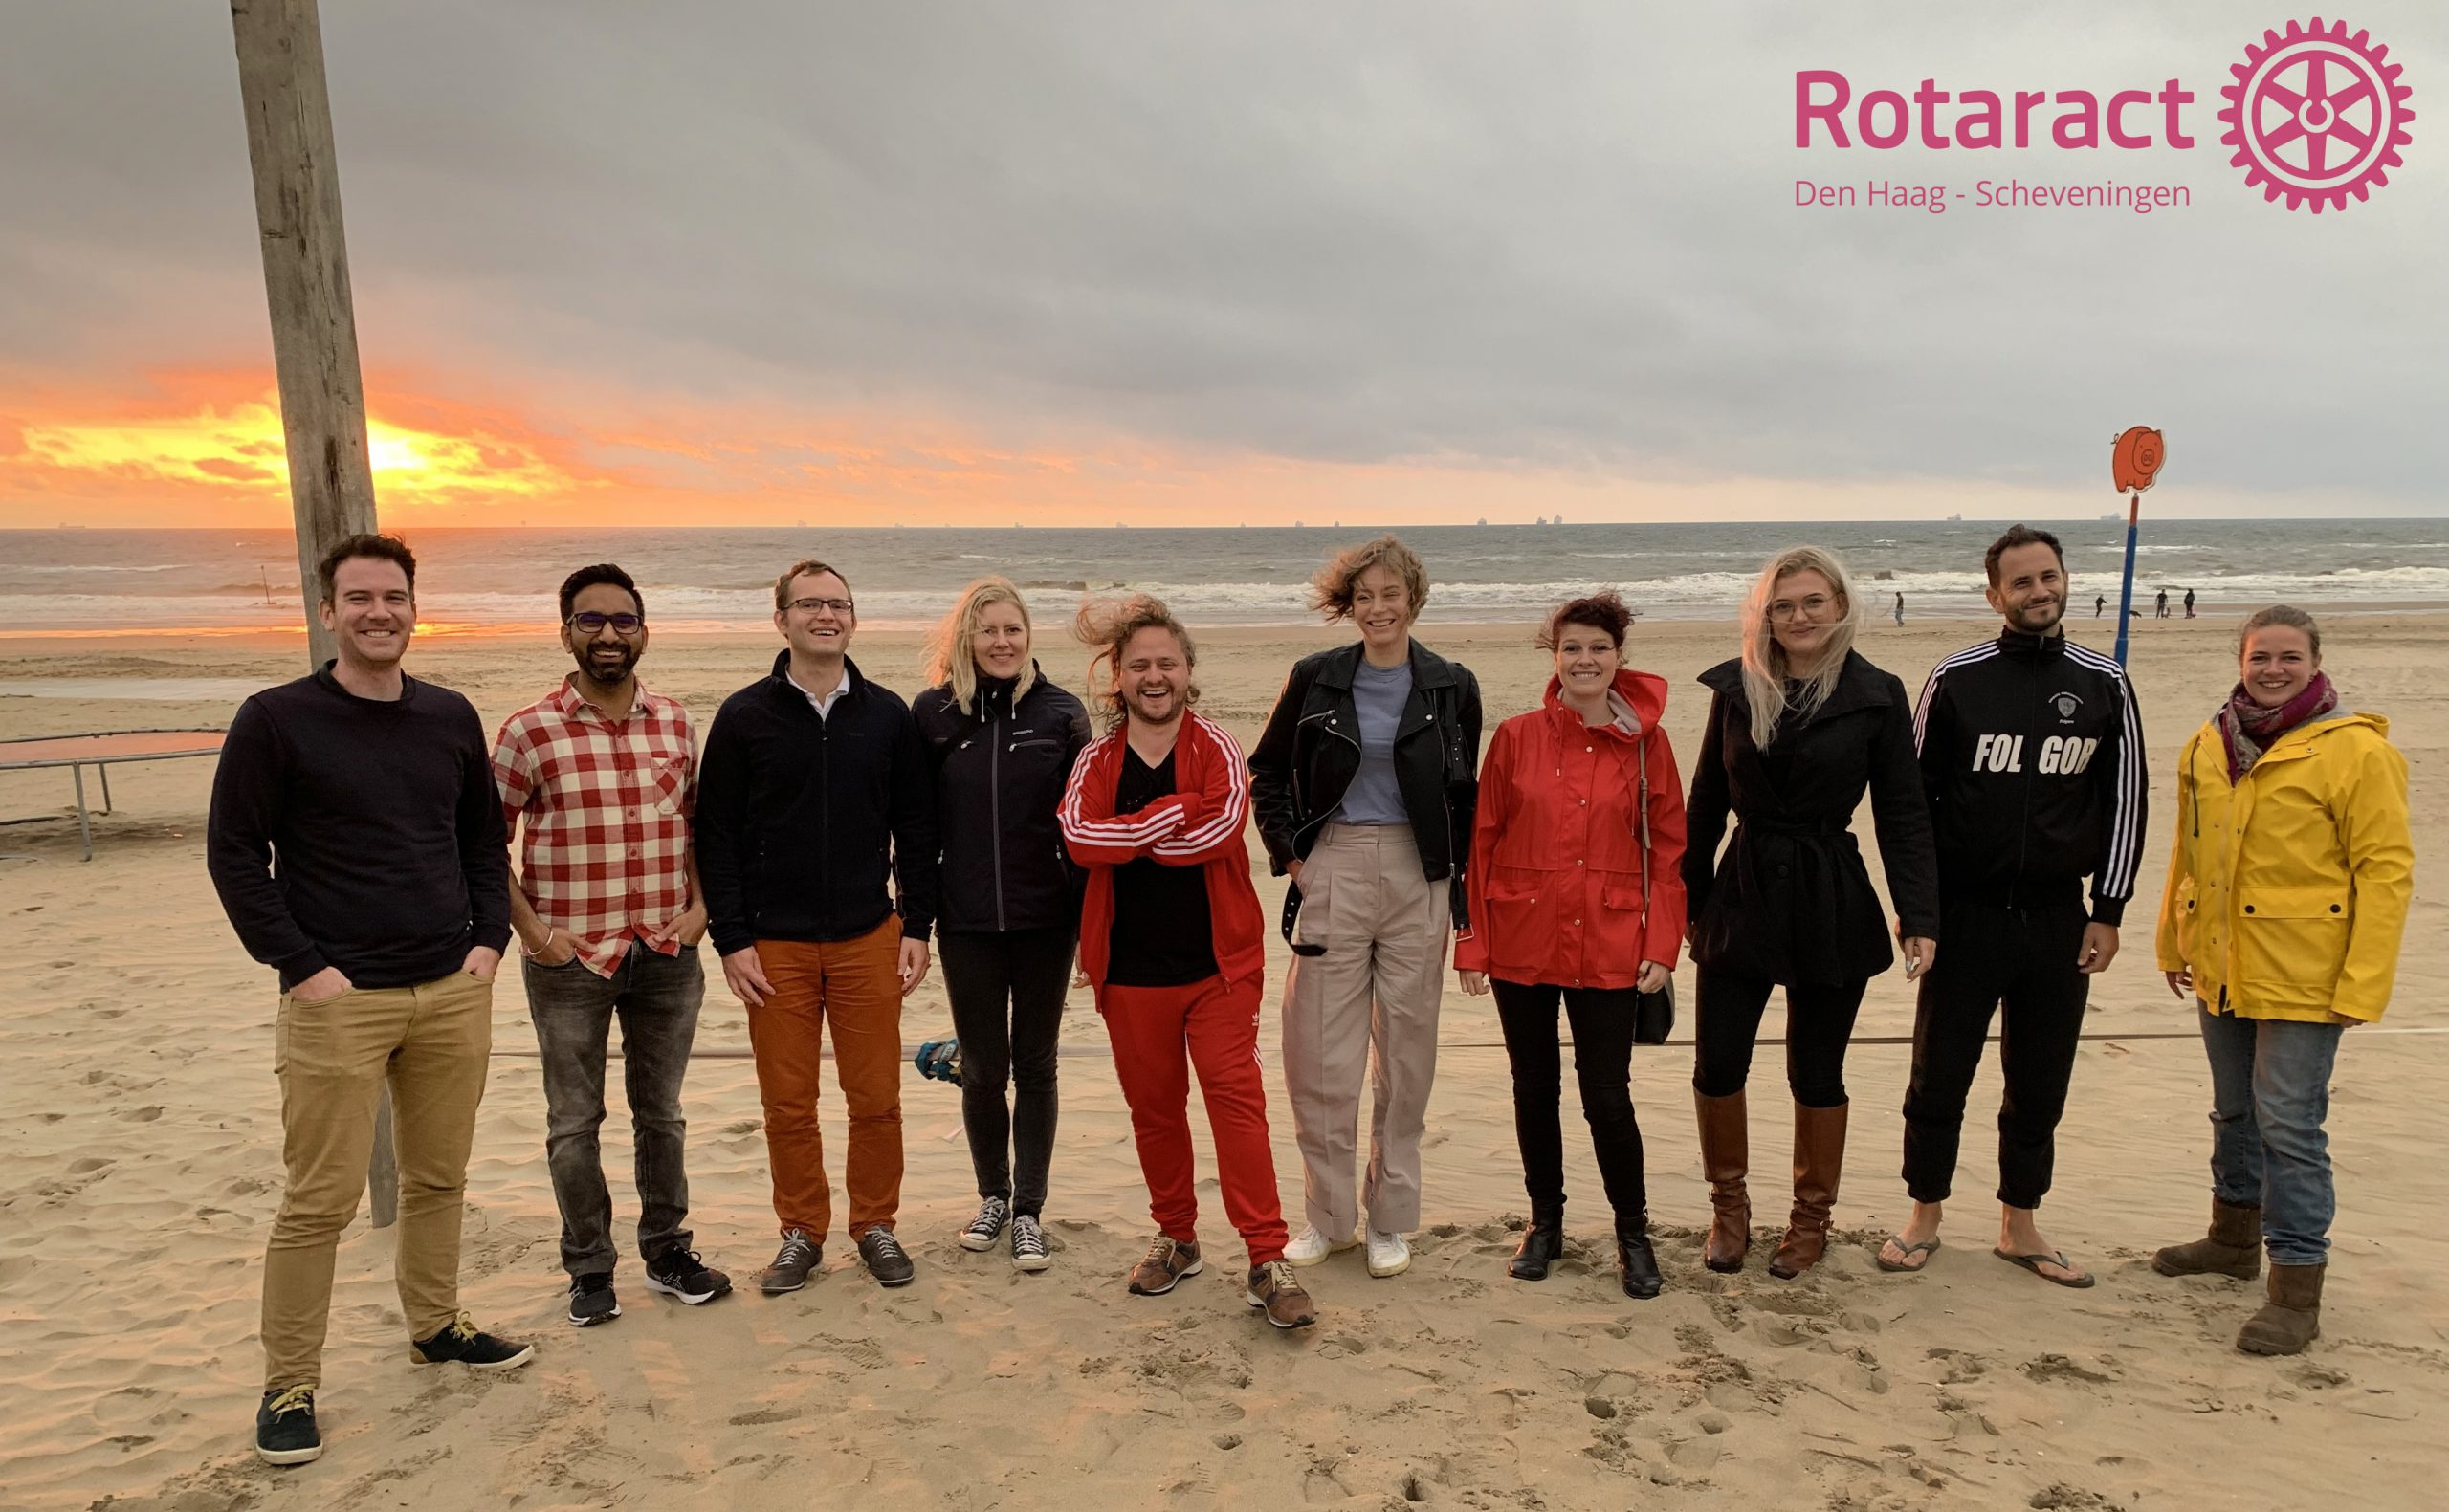 Rotaract Den Haag - Scheveningen